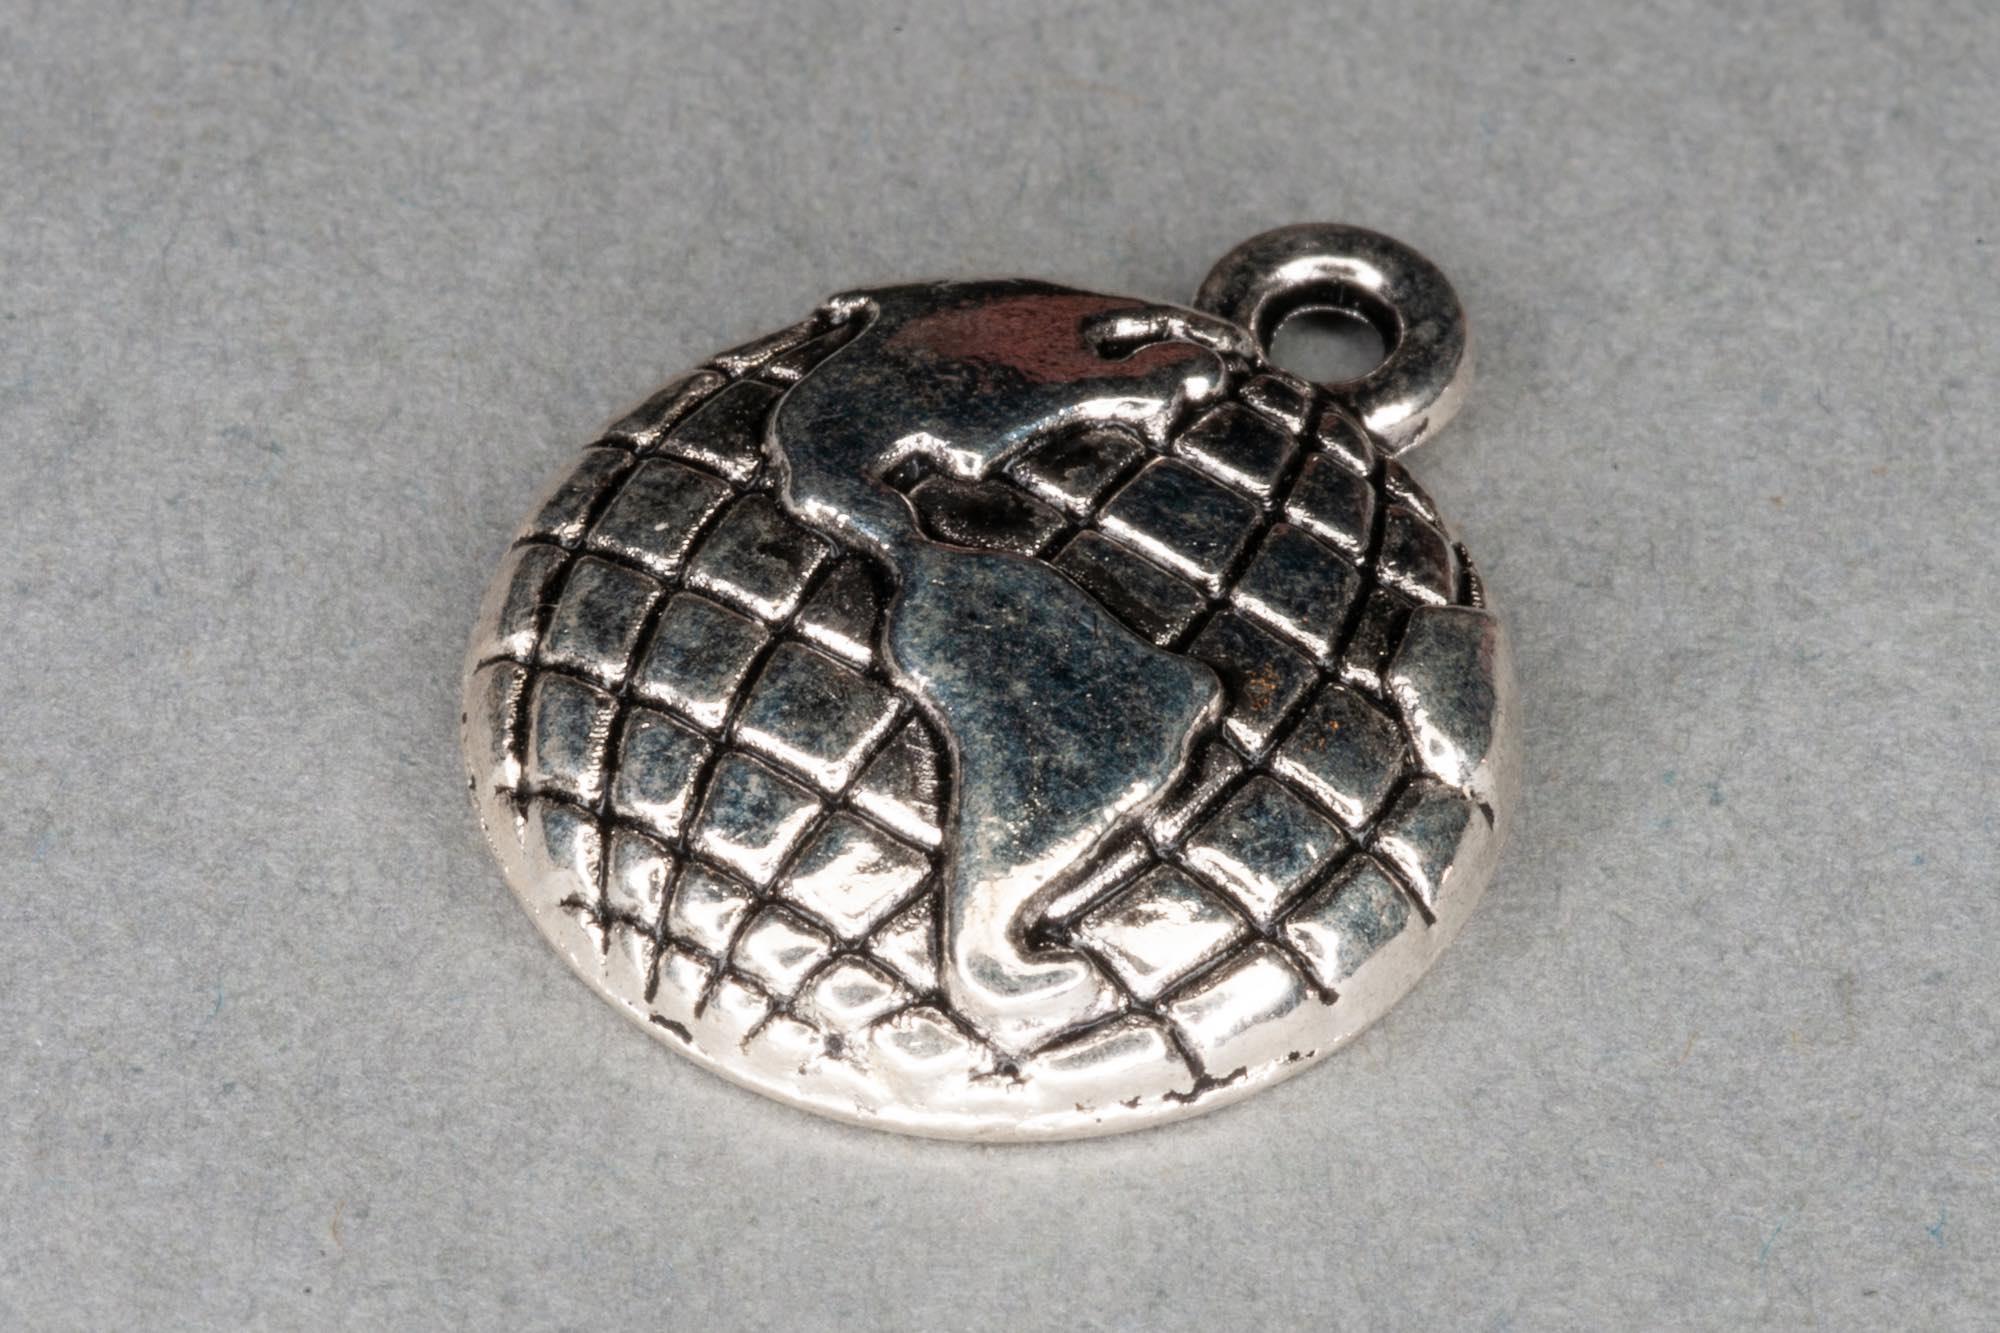 Antique Silver Globe Charm 19x16mm